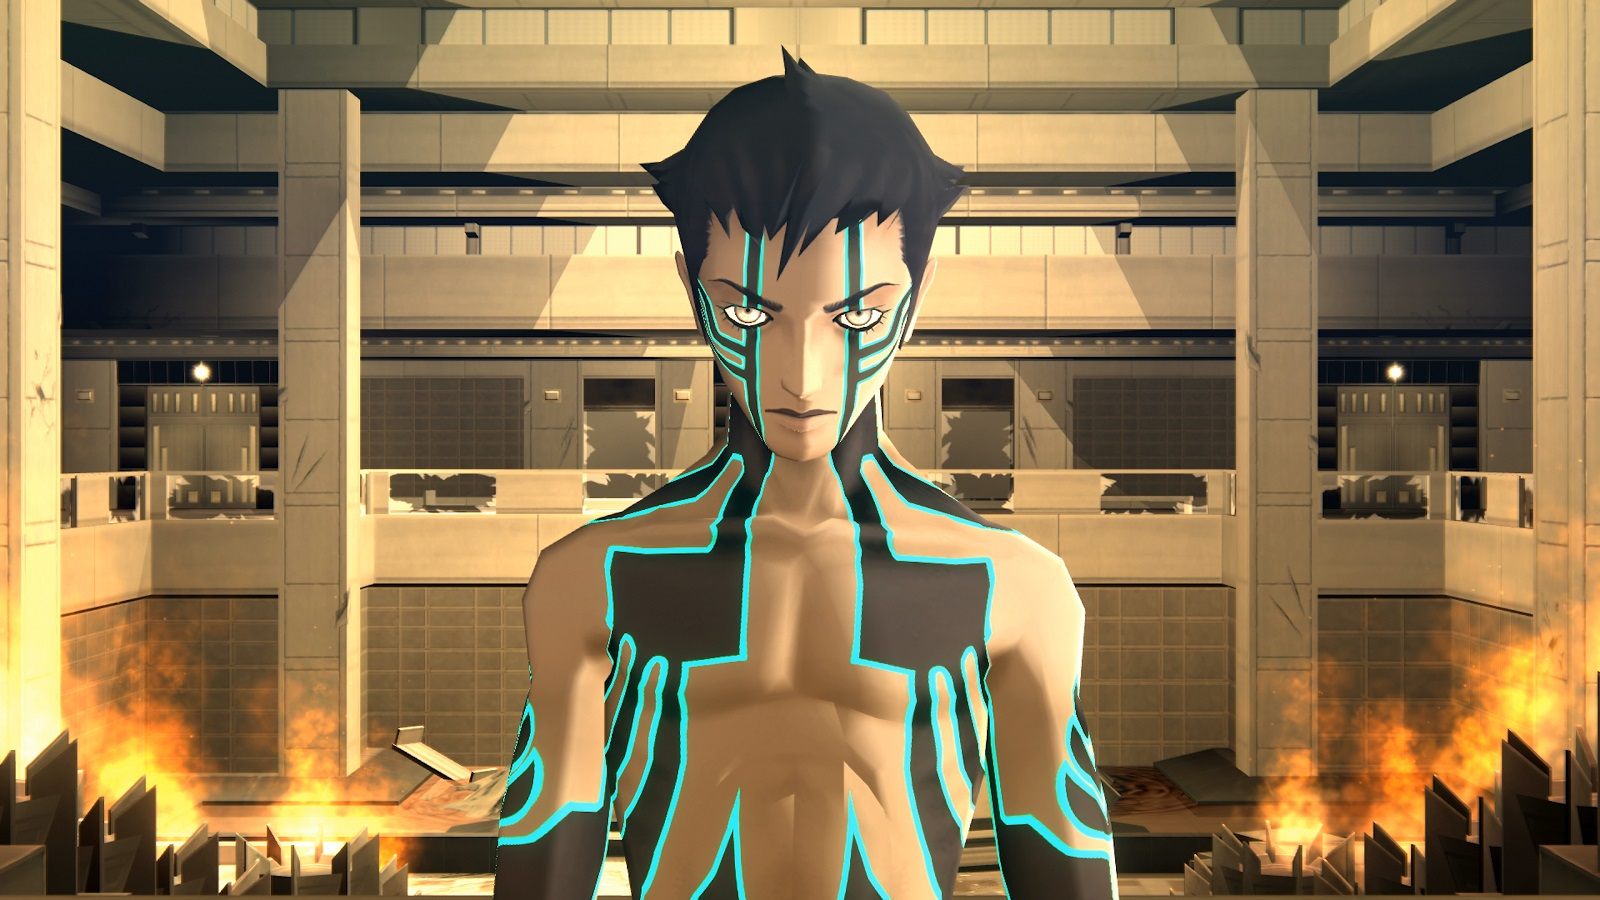 На официальной странице ремастера Shin Megami Tensei III: Nocturne обнаружили упоминание Xbox и Google Stadia